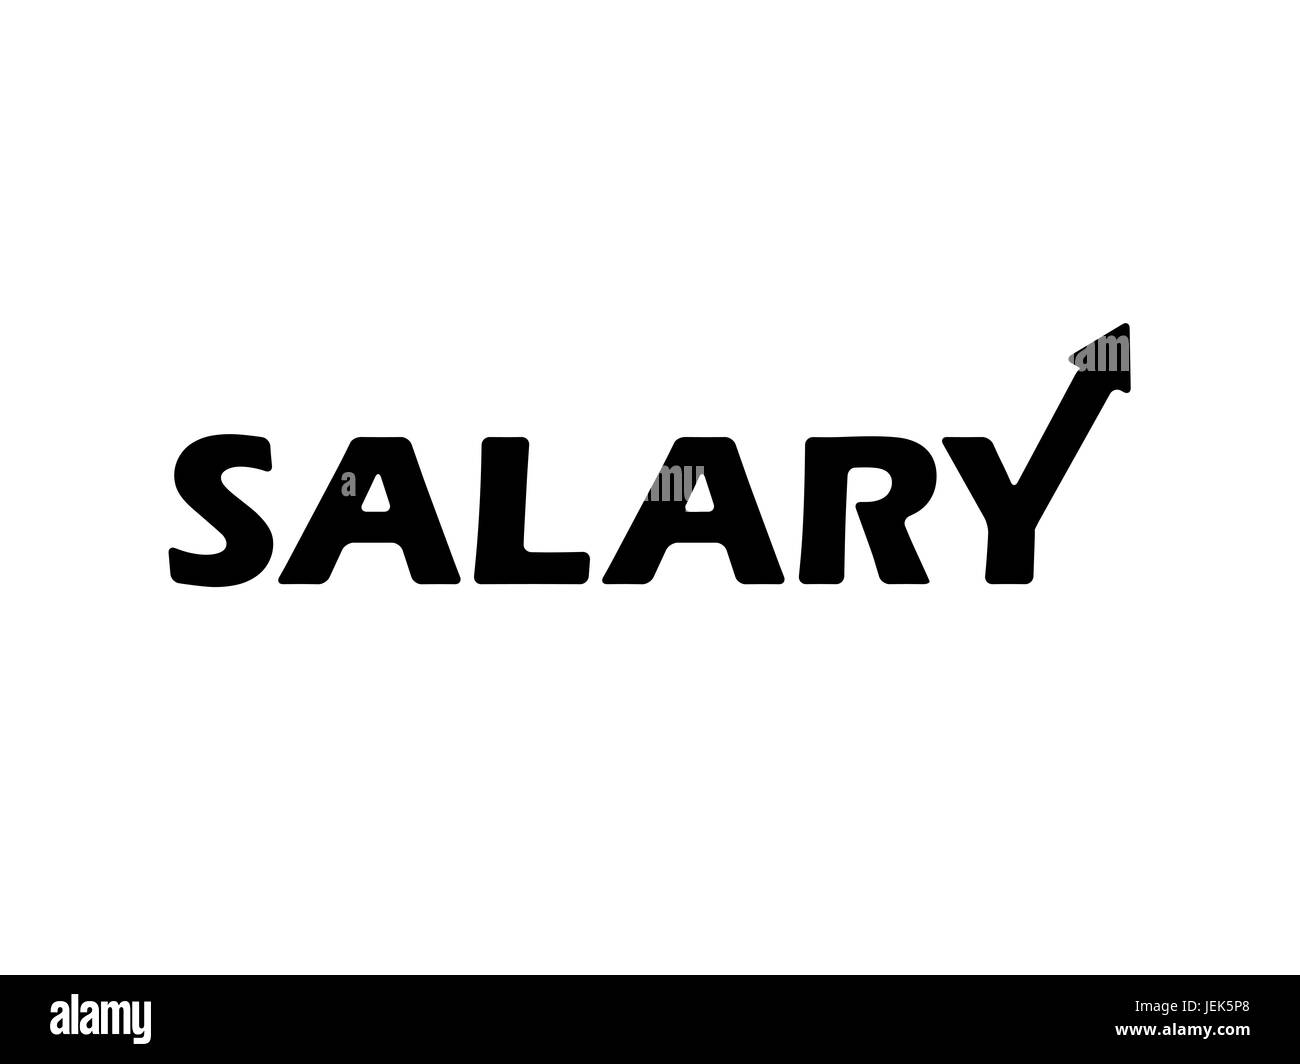 Salary Typographic Concept Design - Stock Image